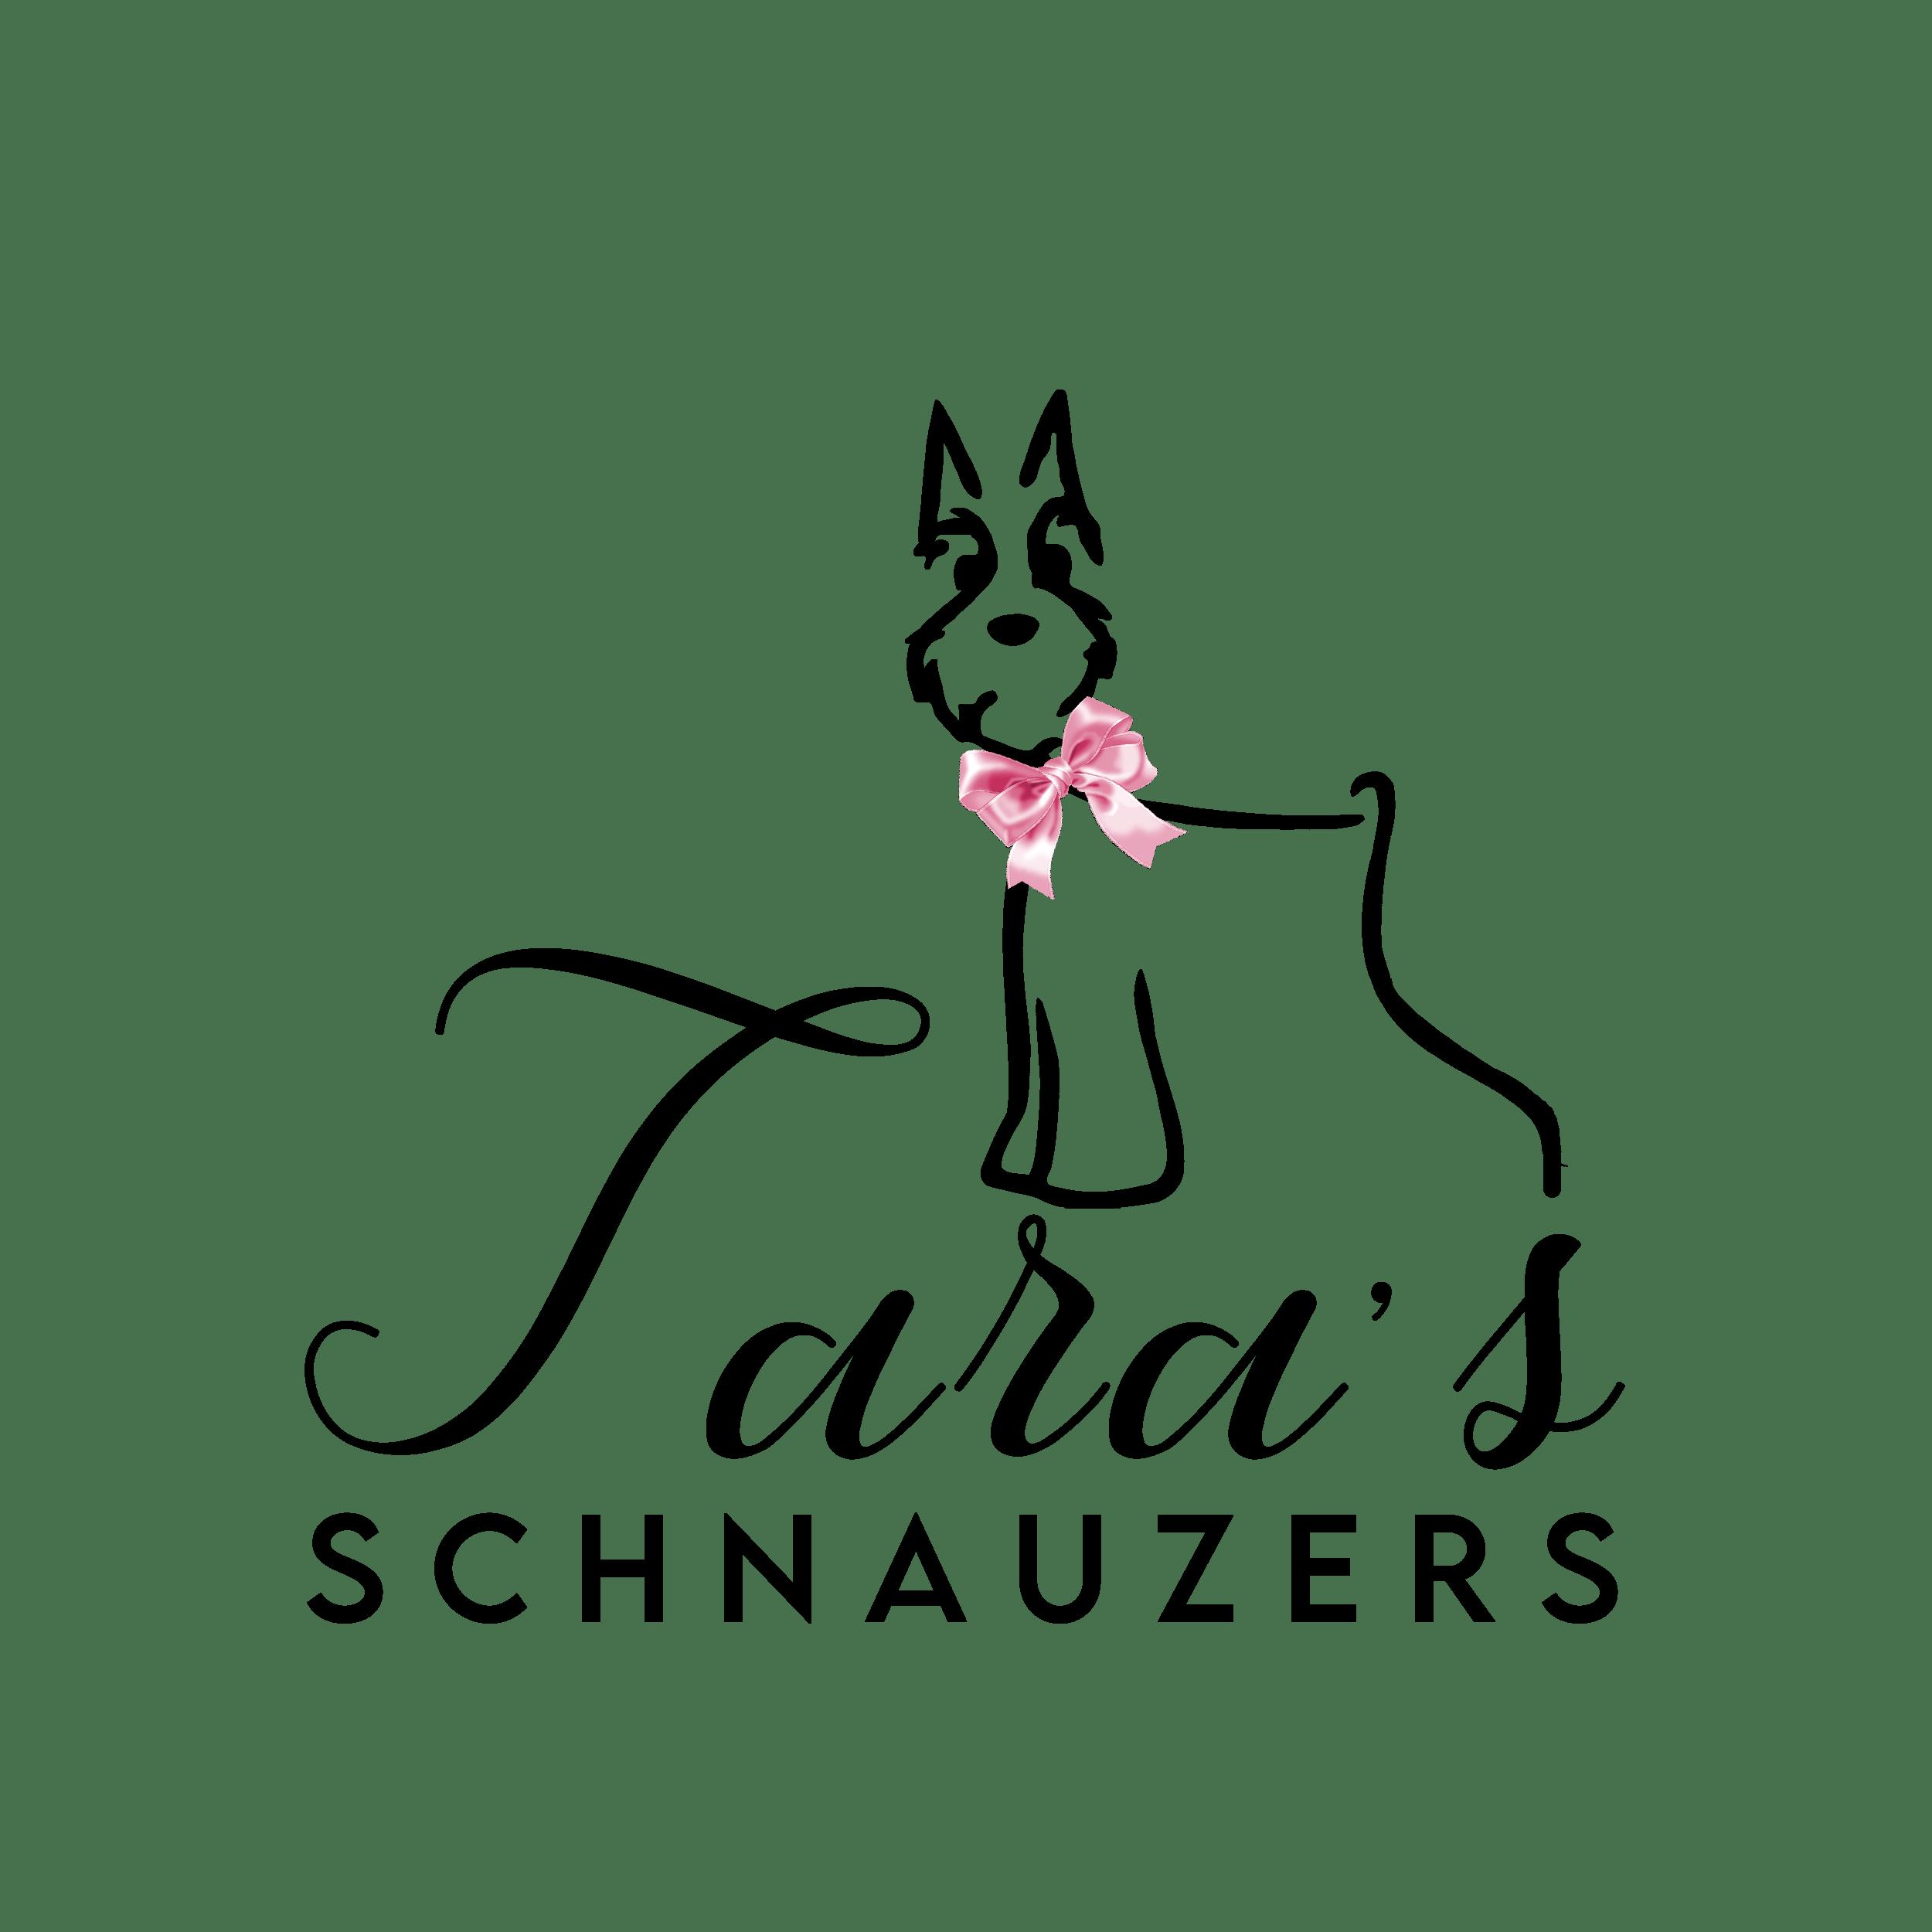 taras-schnauzers-logo-png